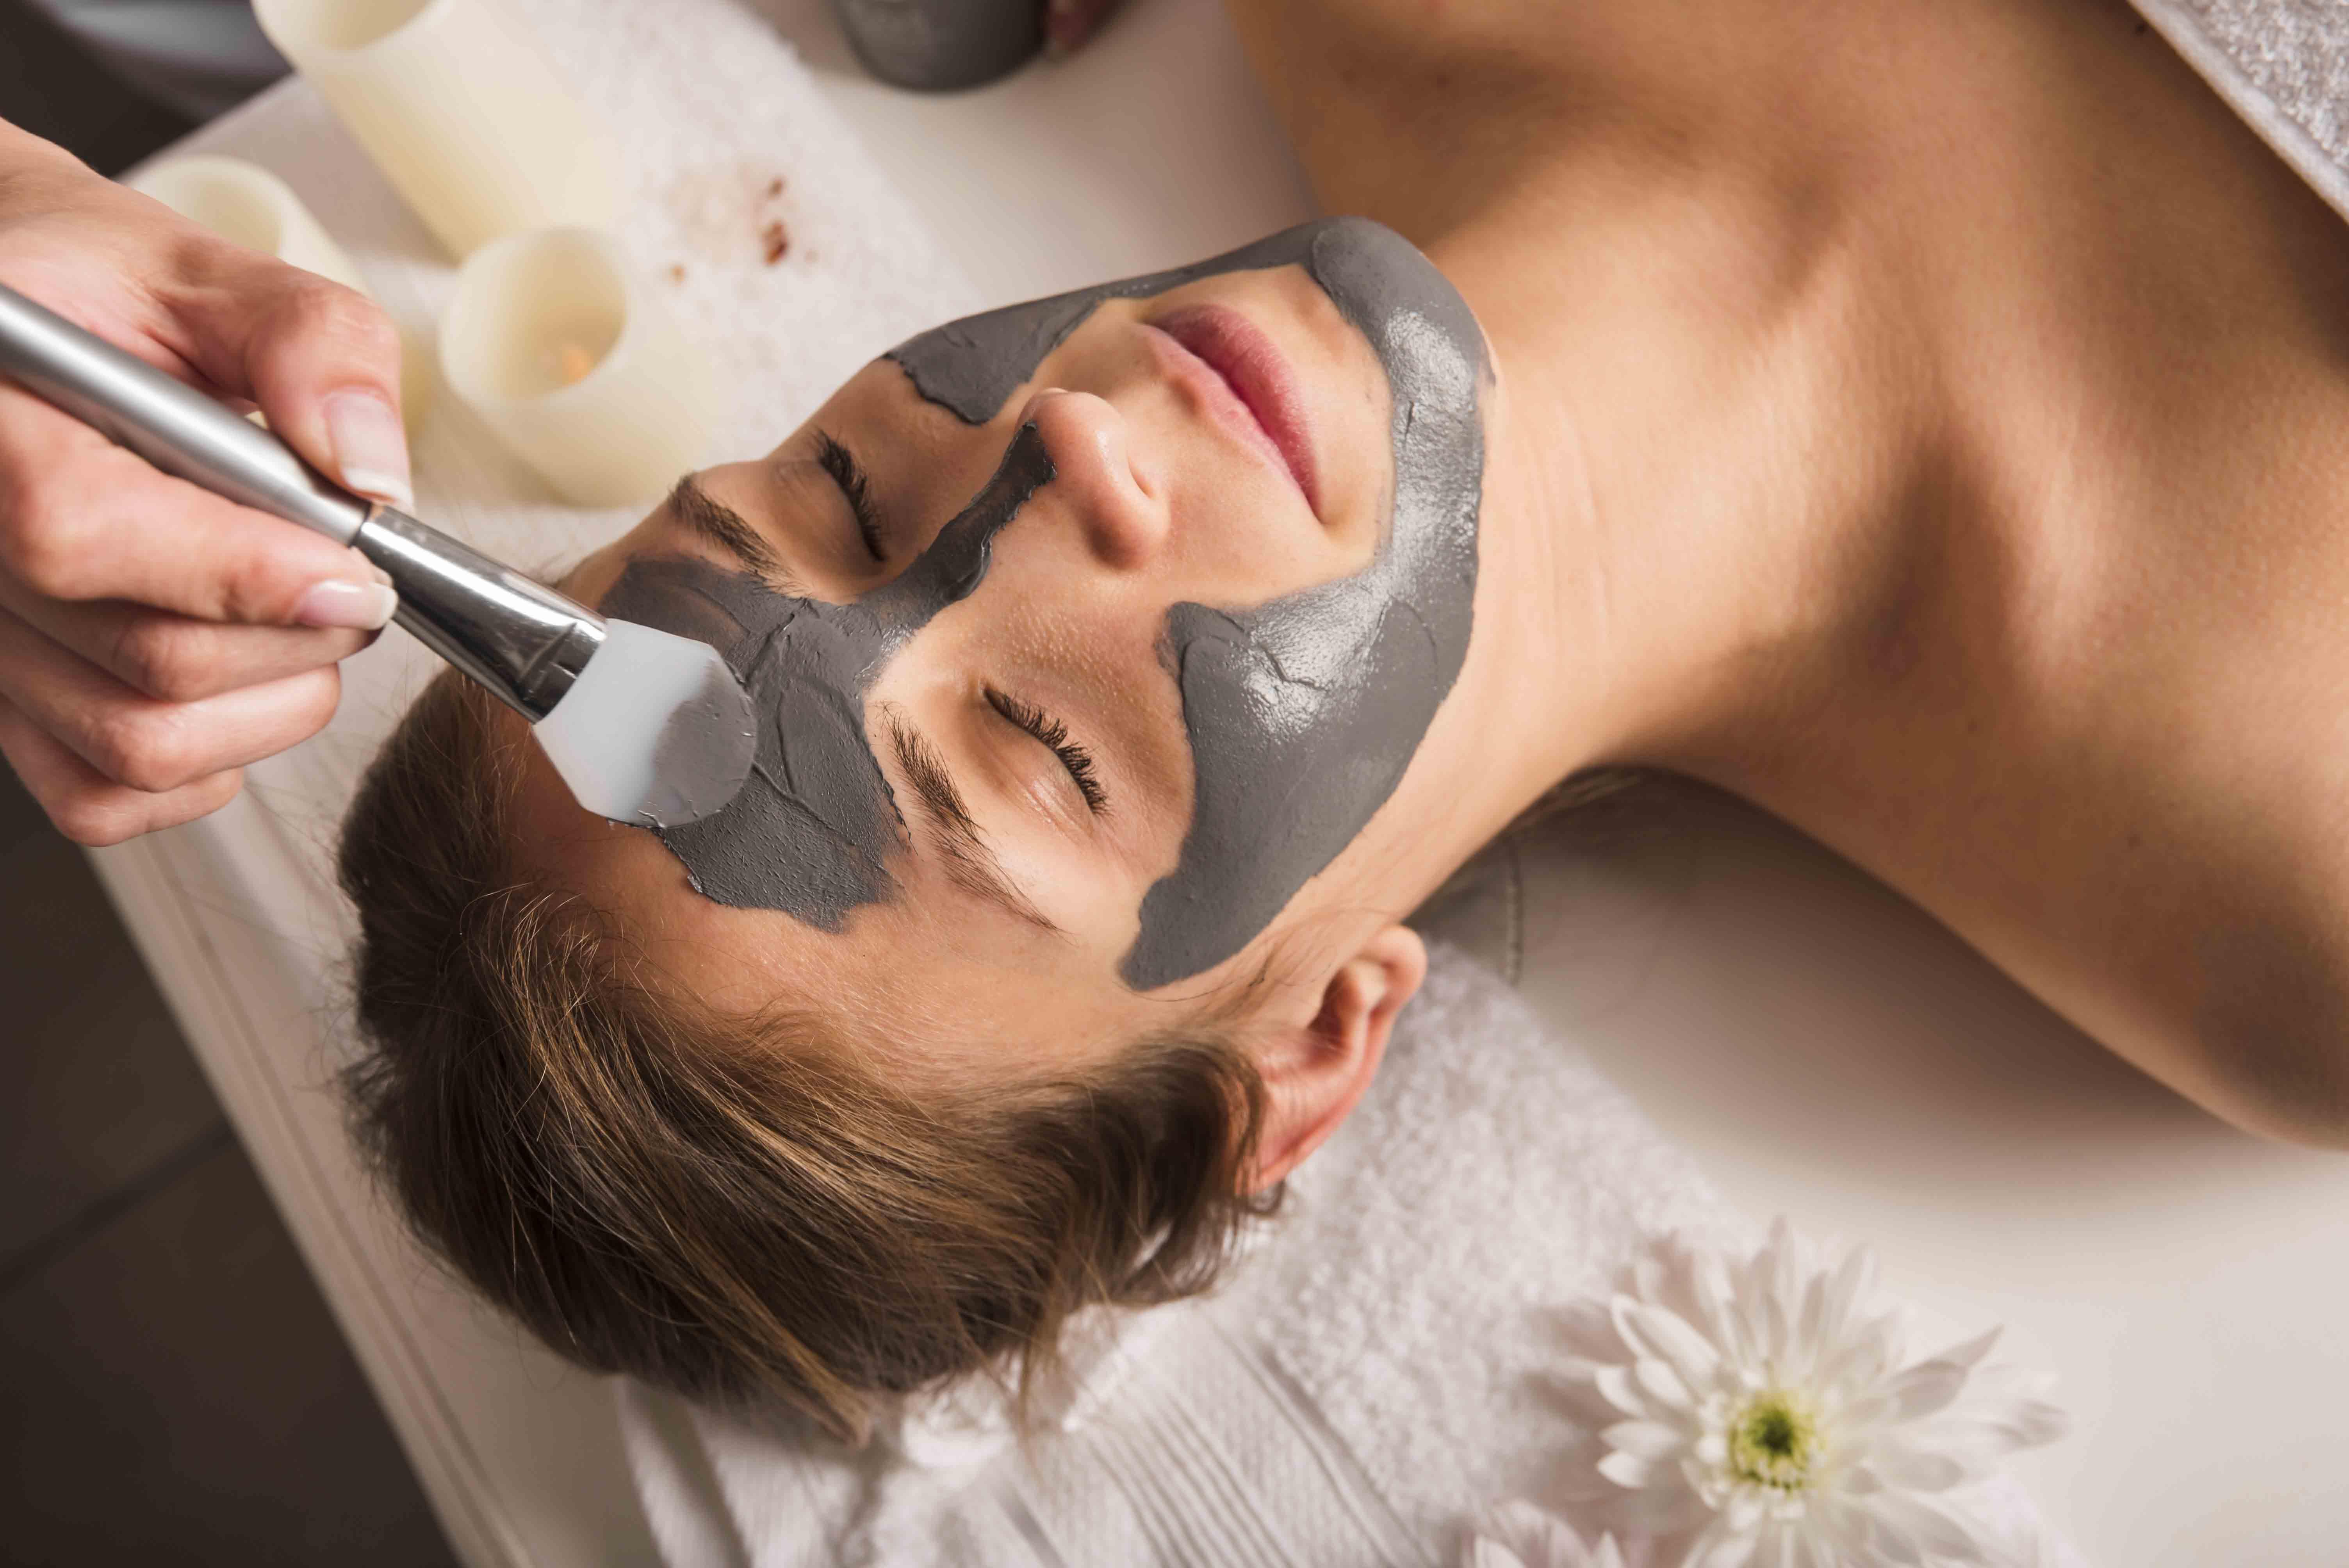 nettoyage profond de la peau